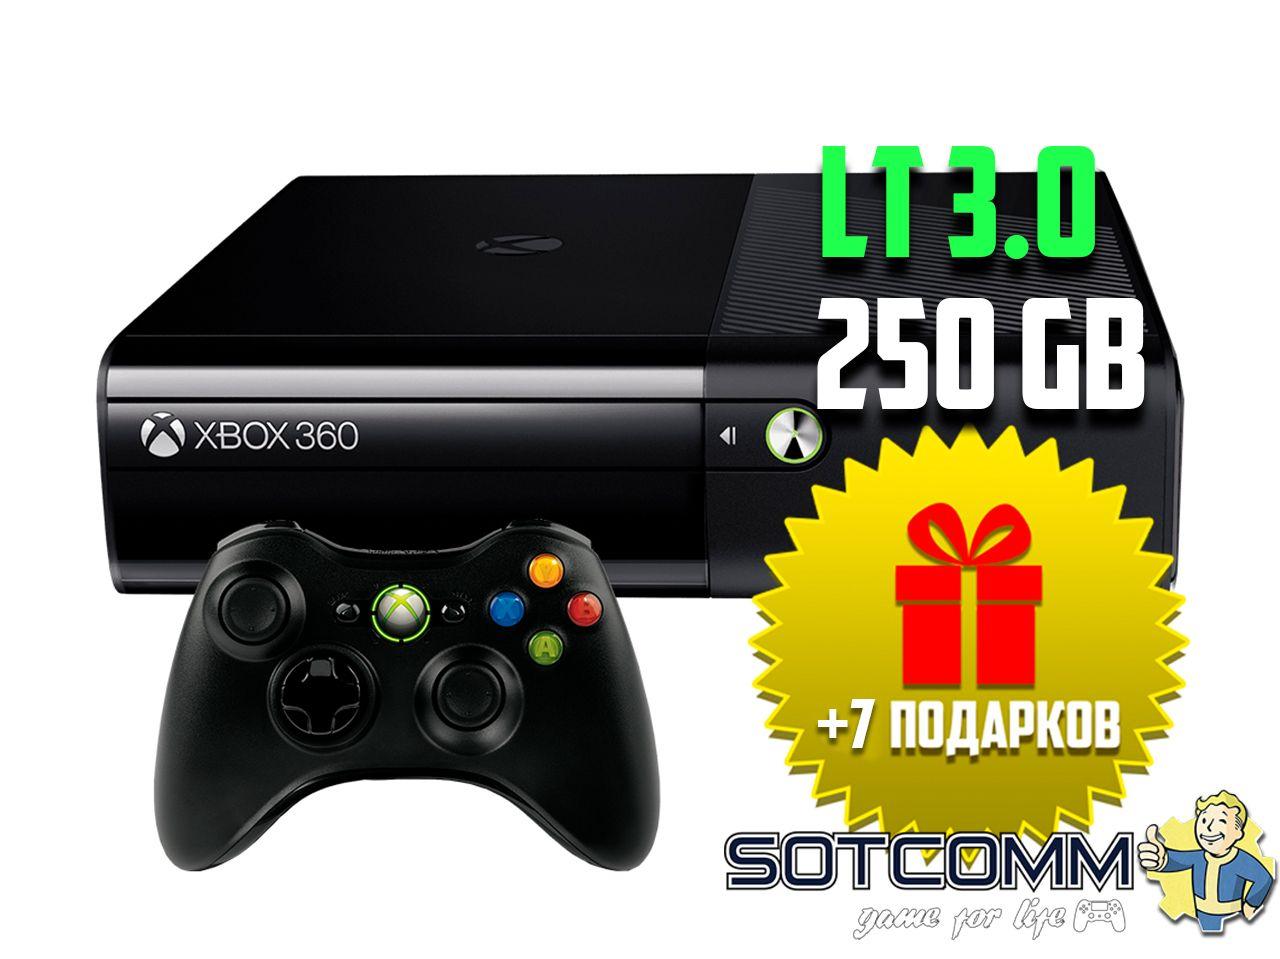 XBOX 360 250 Gb LT+3.0 (Прошитый)